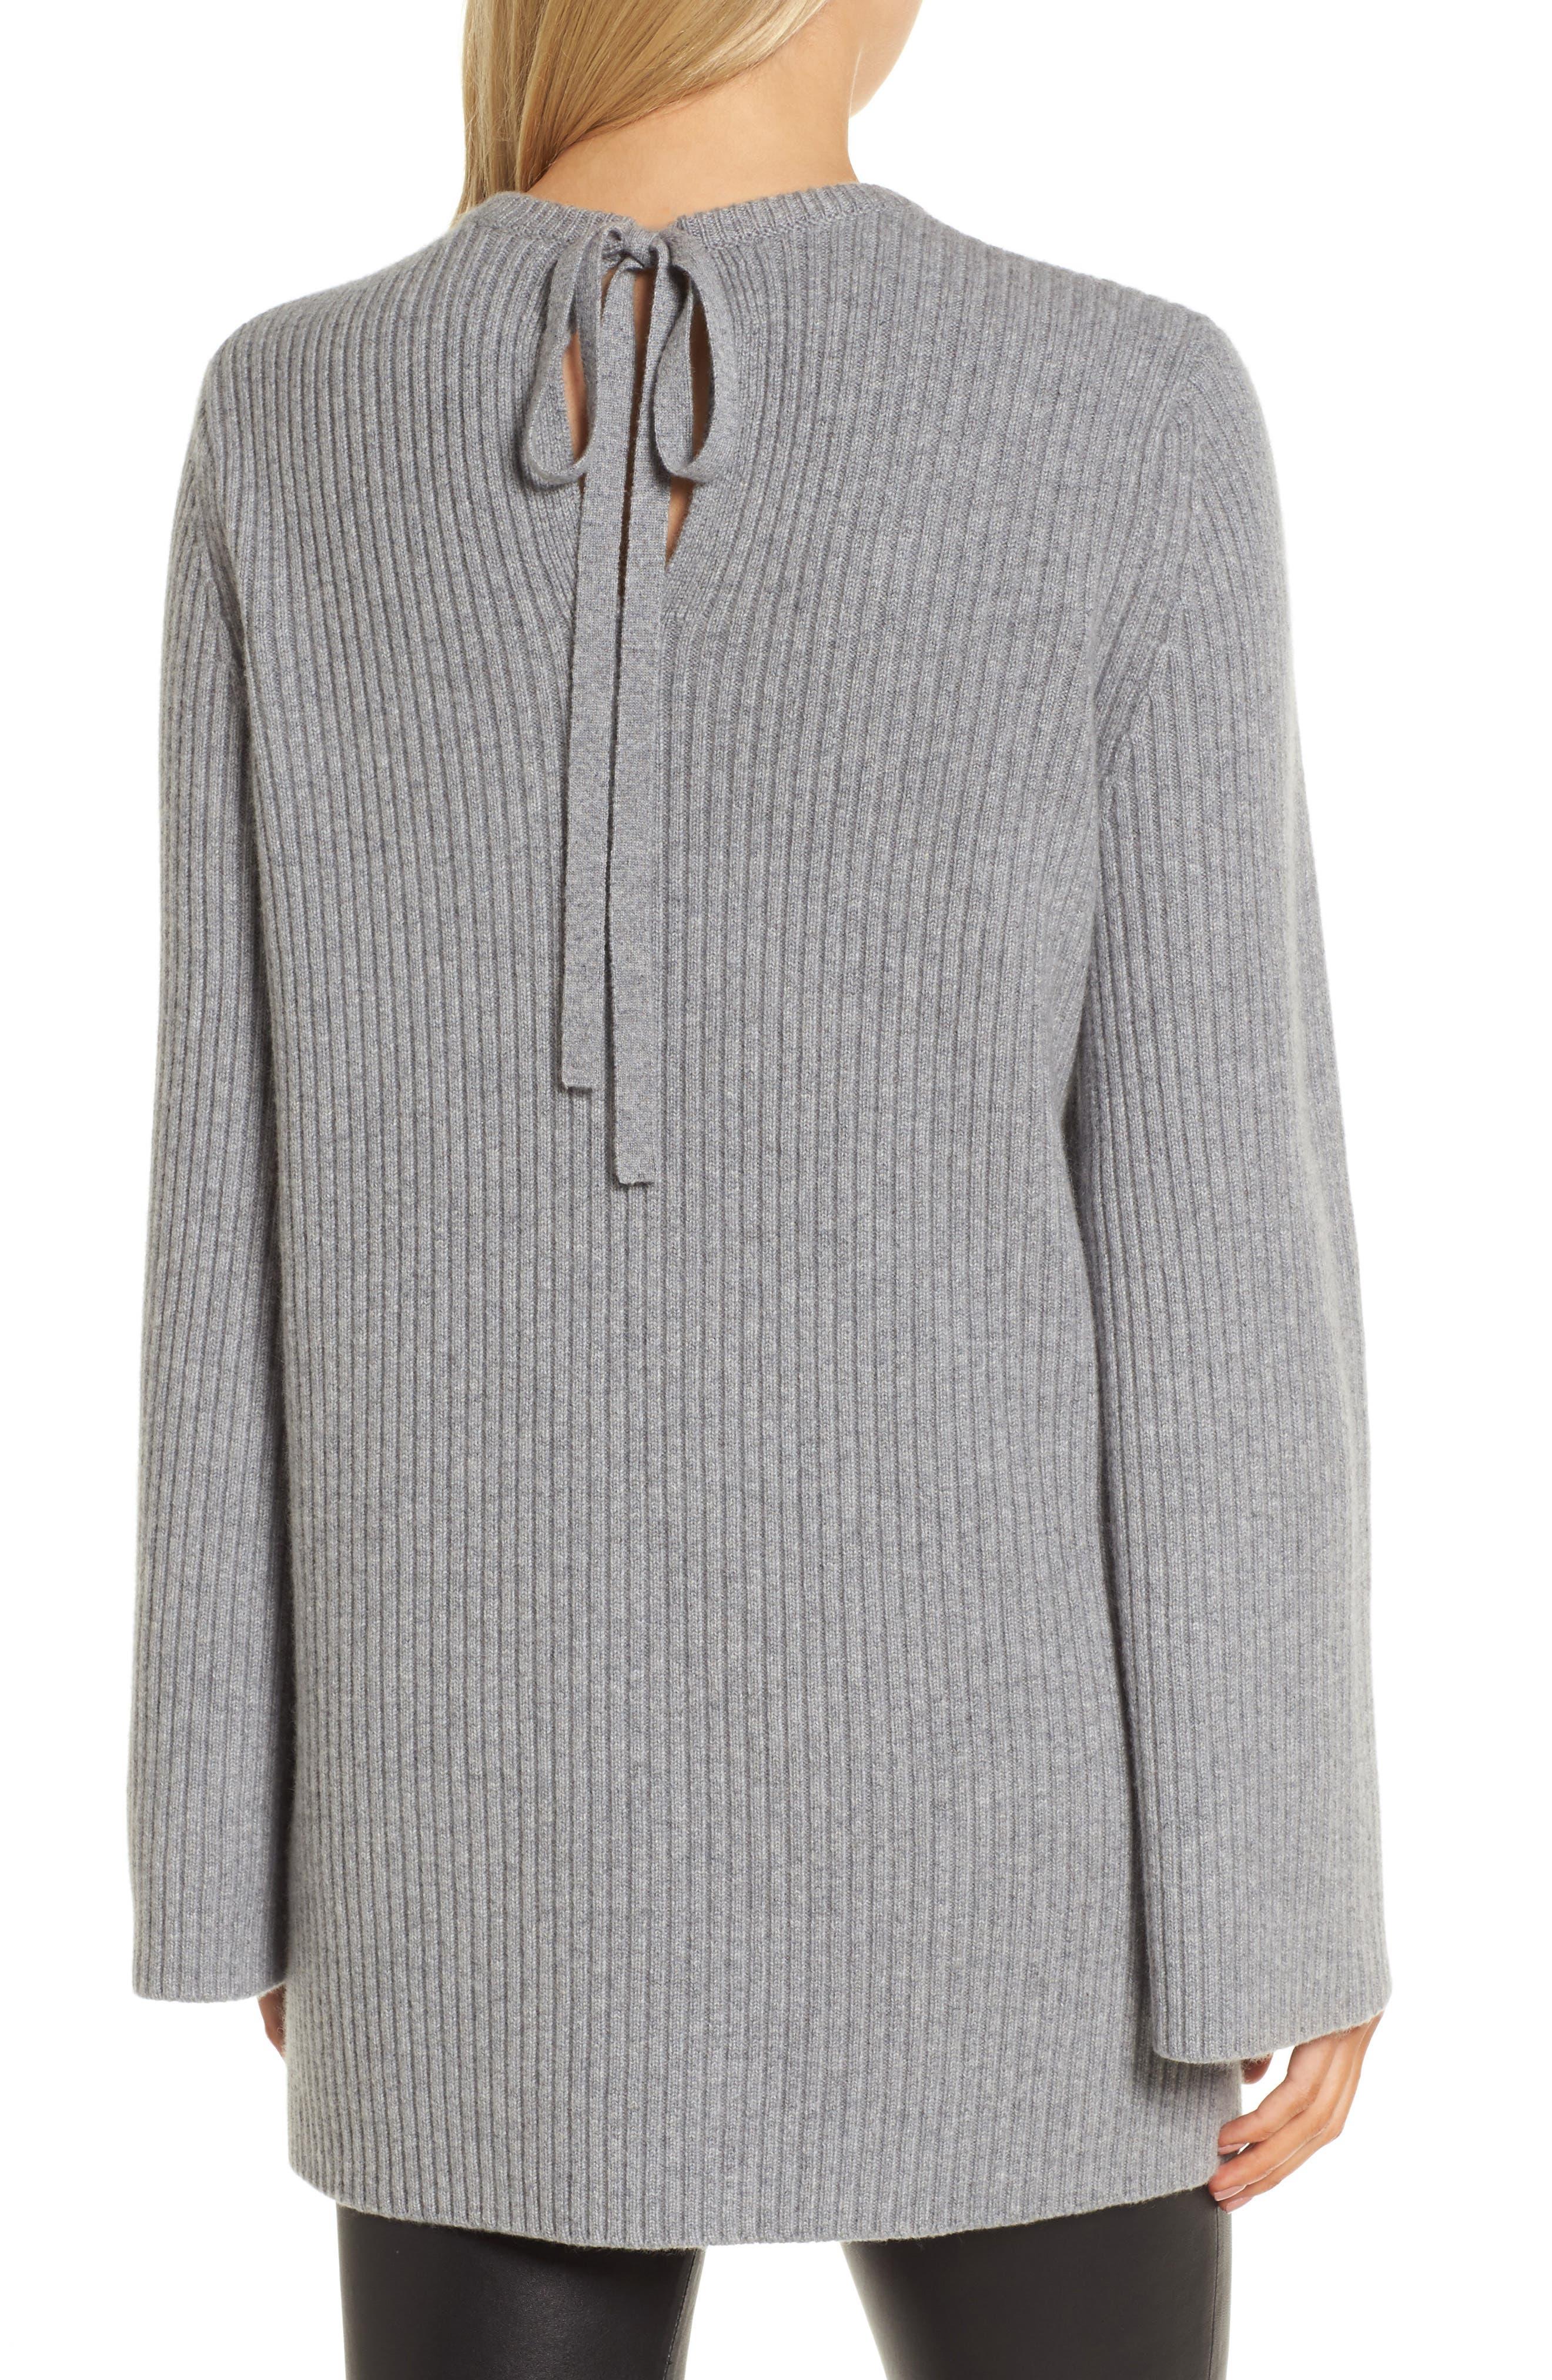 Tie Back Cashmere Blend Sweater,                             Alternate thumbnail 2, color,                             Grey Filigree Heather